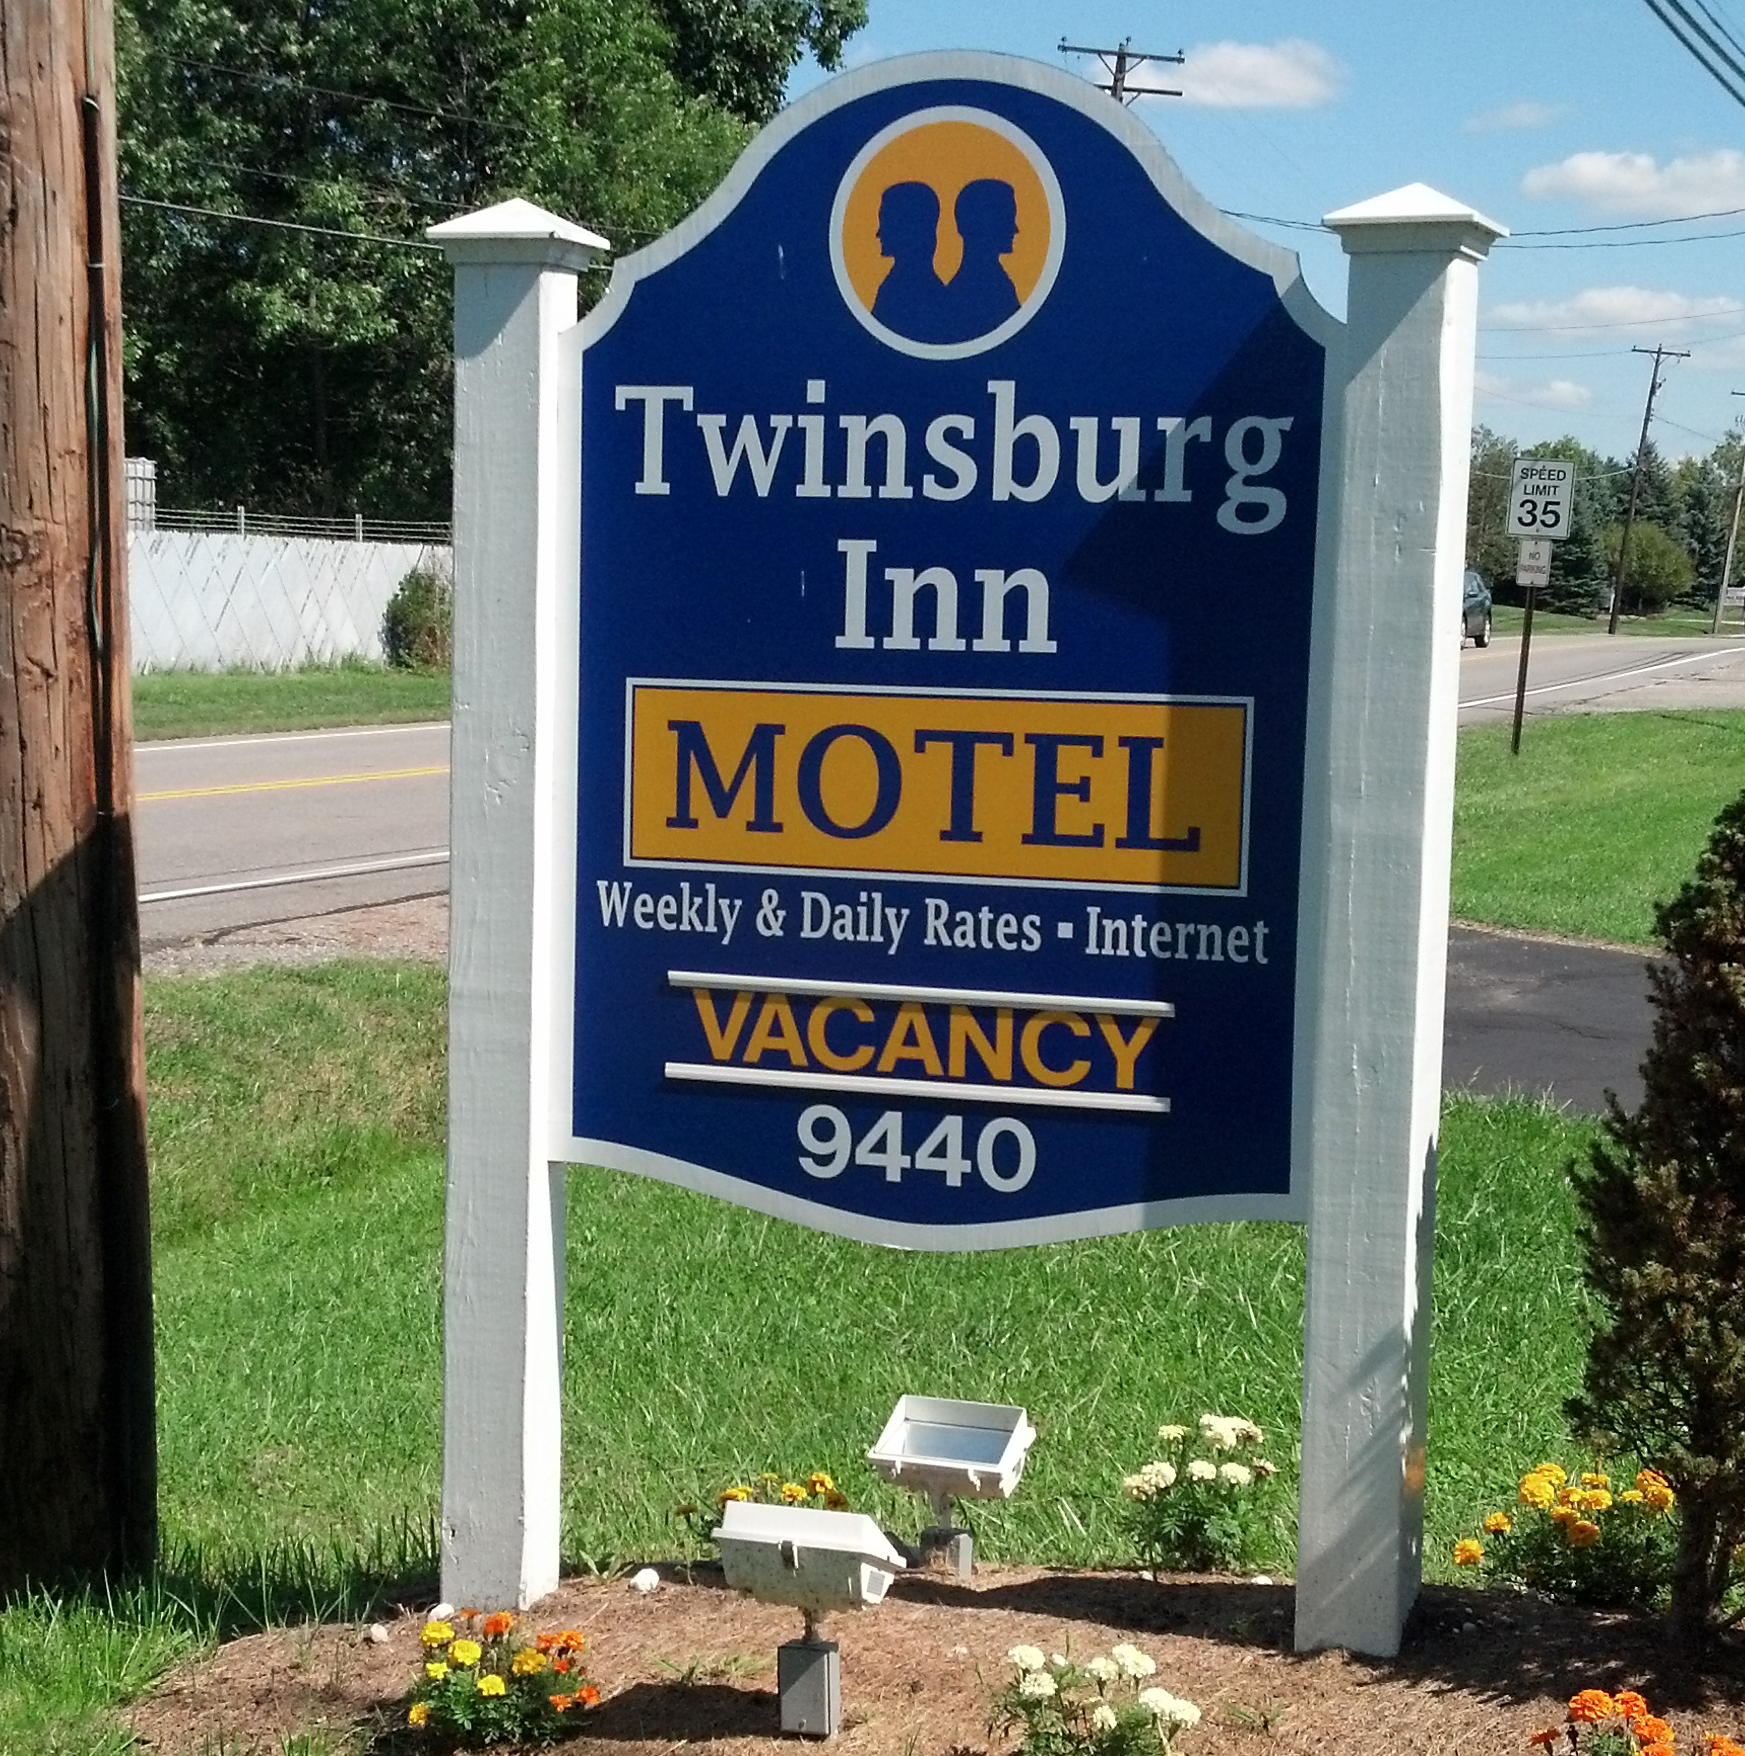 Twinsburg Inn